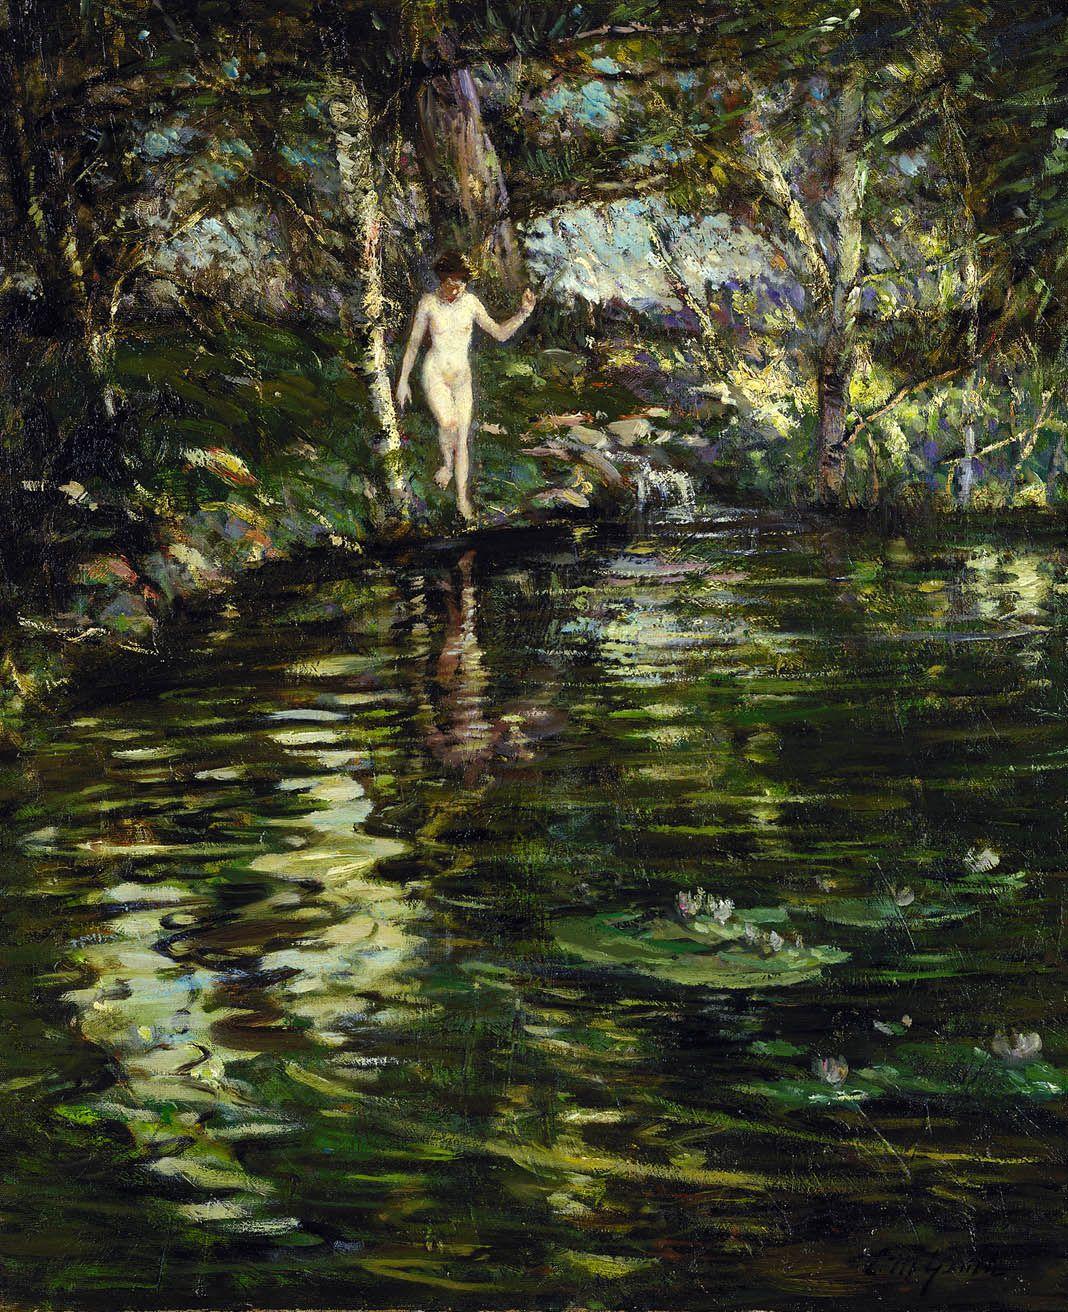 Depths of the Woods - Lillian Mathilde Genth ~1910